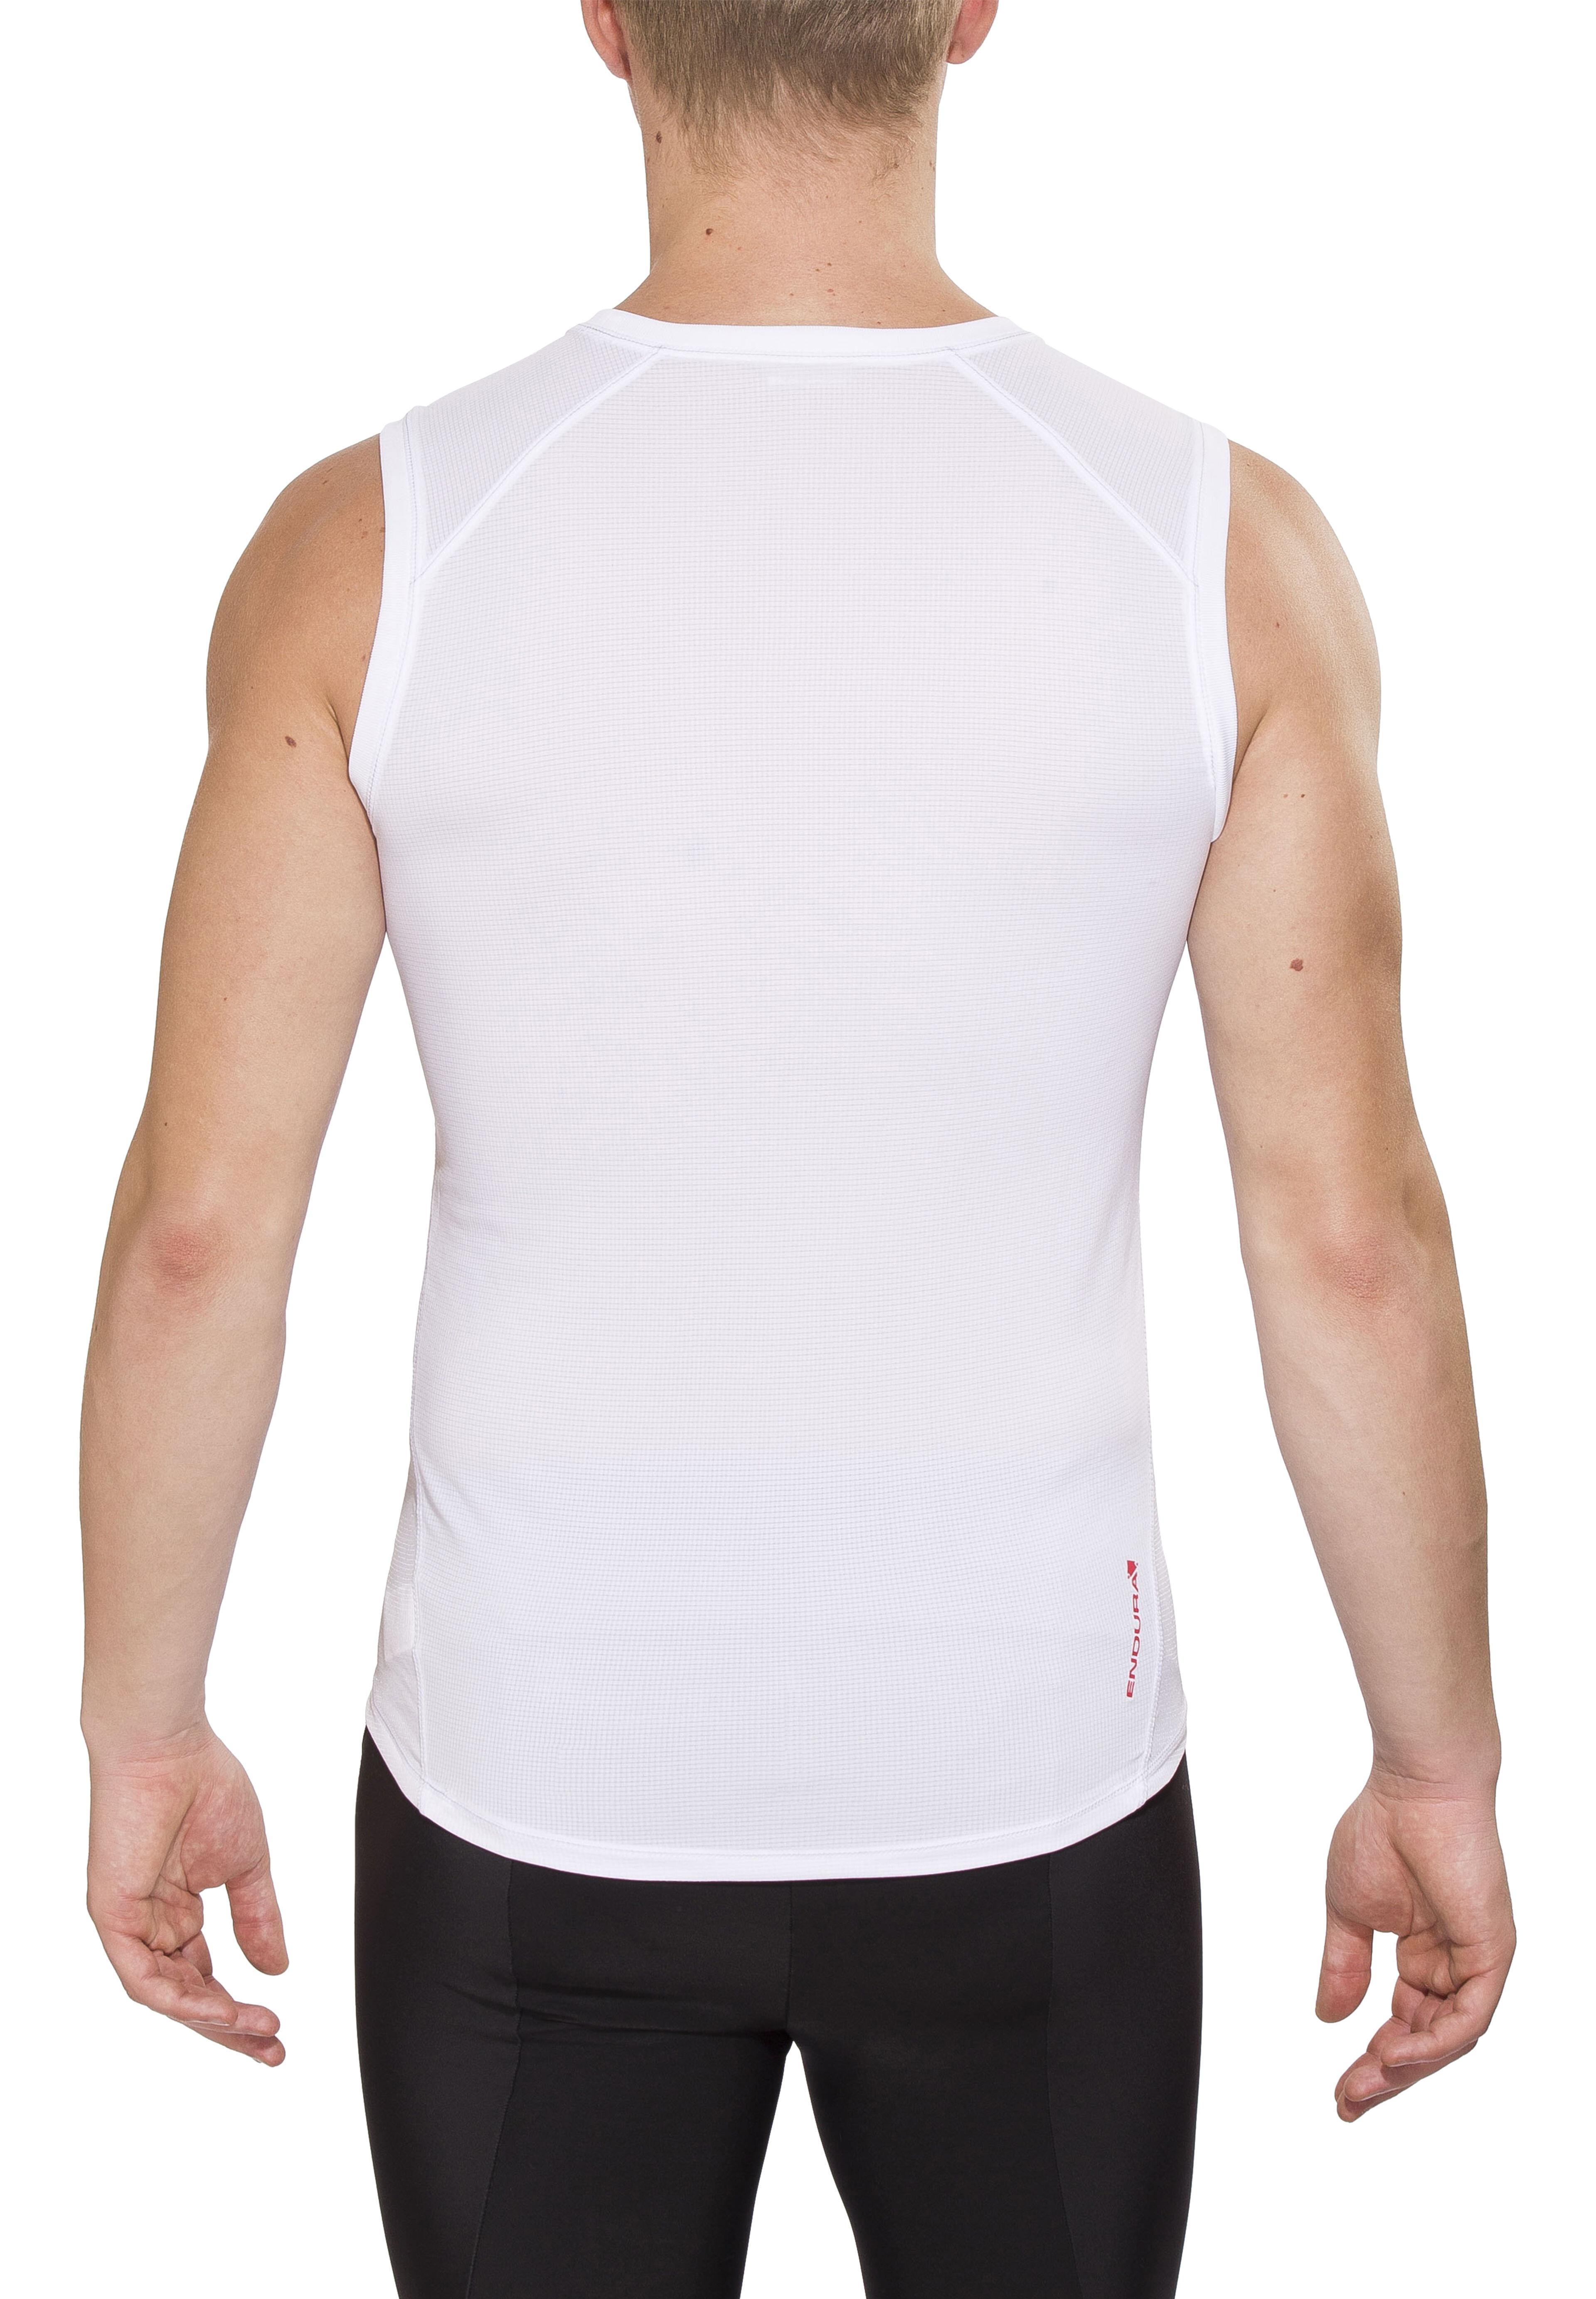 911a725acba50 Endura Translite Cycling Underwear Men white at Bikester.co.uk